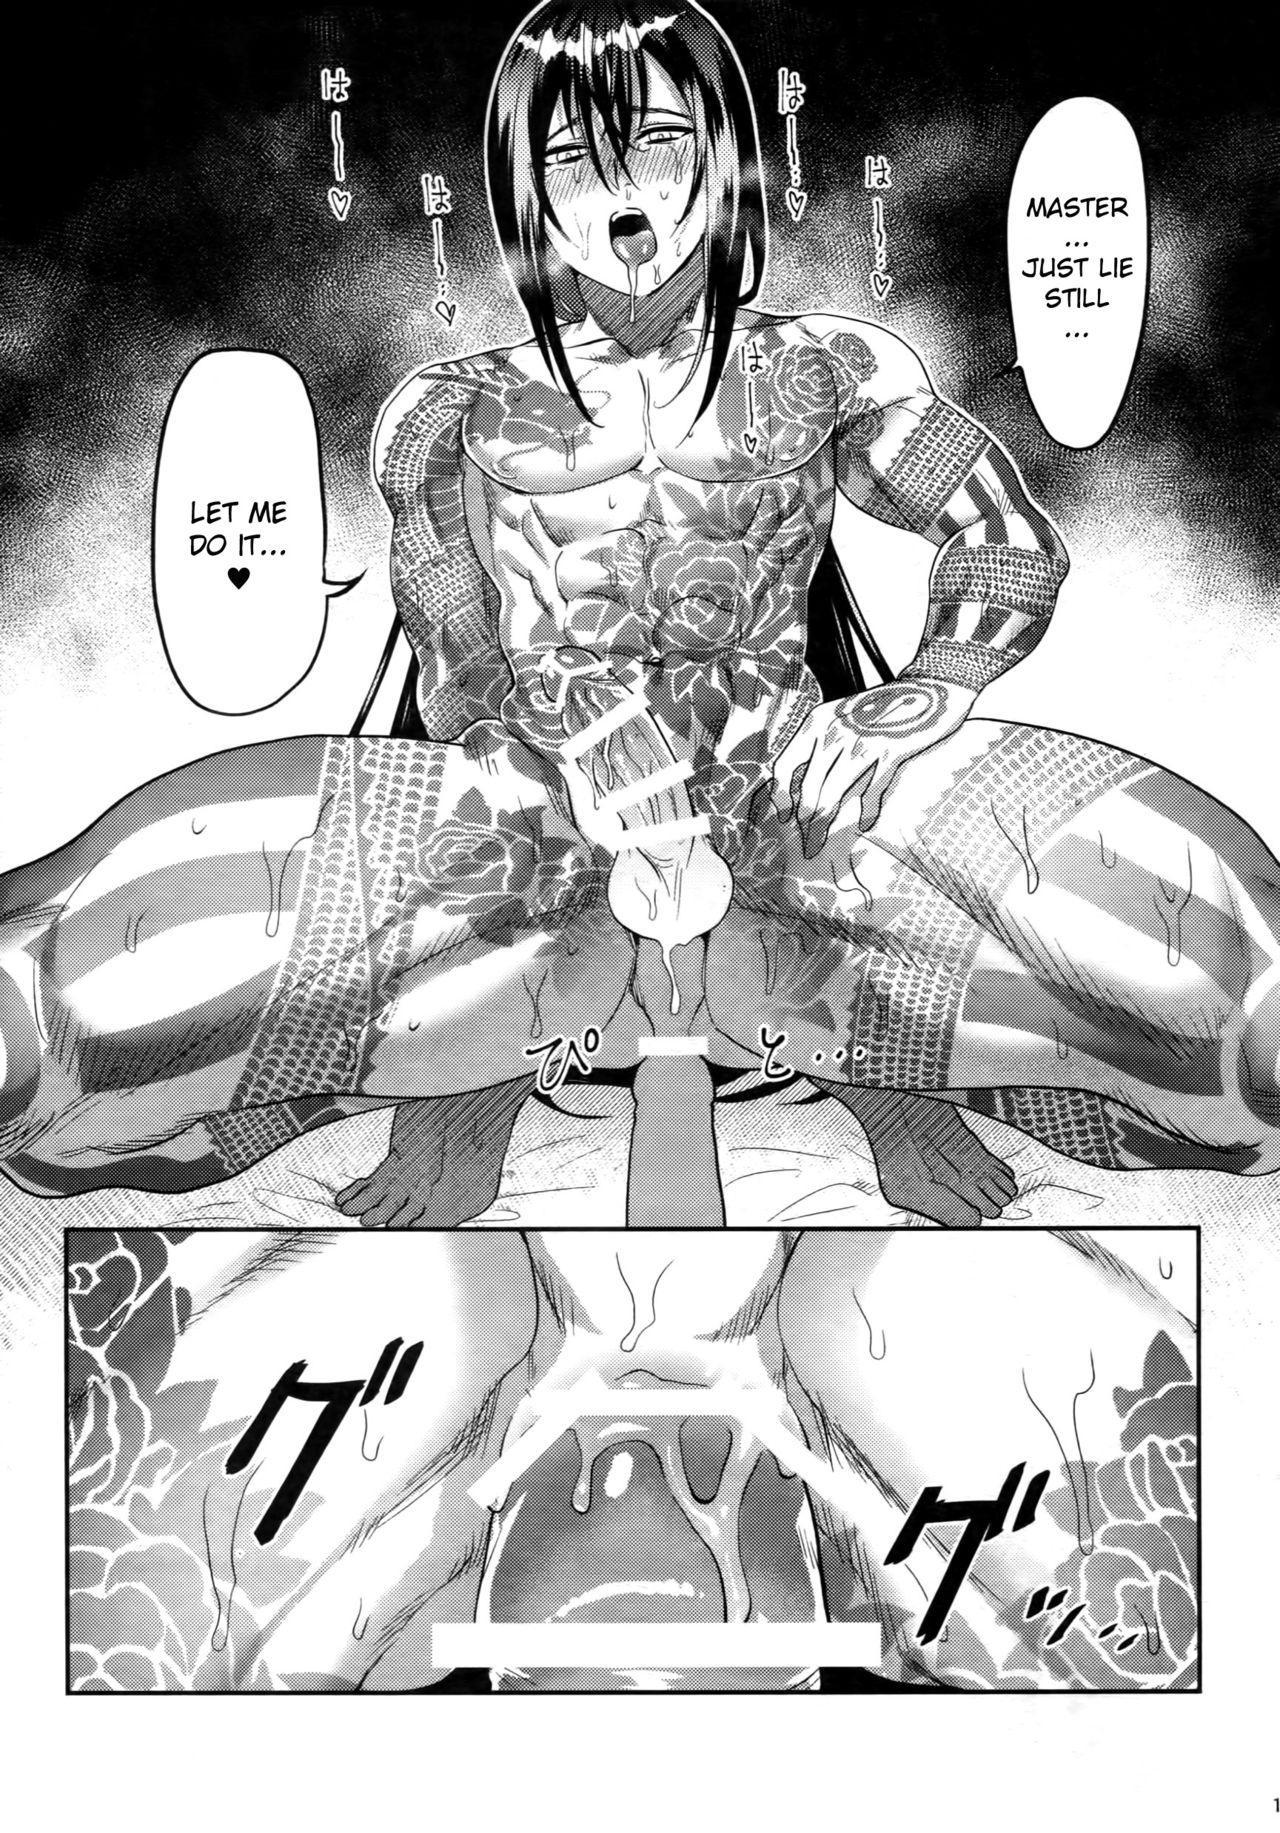 (Super ROOT 4 to 5 2019) [xxkorori (Ko Tora)] Kando 500-bai Yami no Kyoukaku Nonstop Namahame 24-ji | 500-times Enhanced 24-hour Nonstop Raw Sex Session with the Guest of Darkness (Fate/Grand Order) [English] [MintVoid] 12